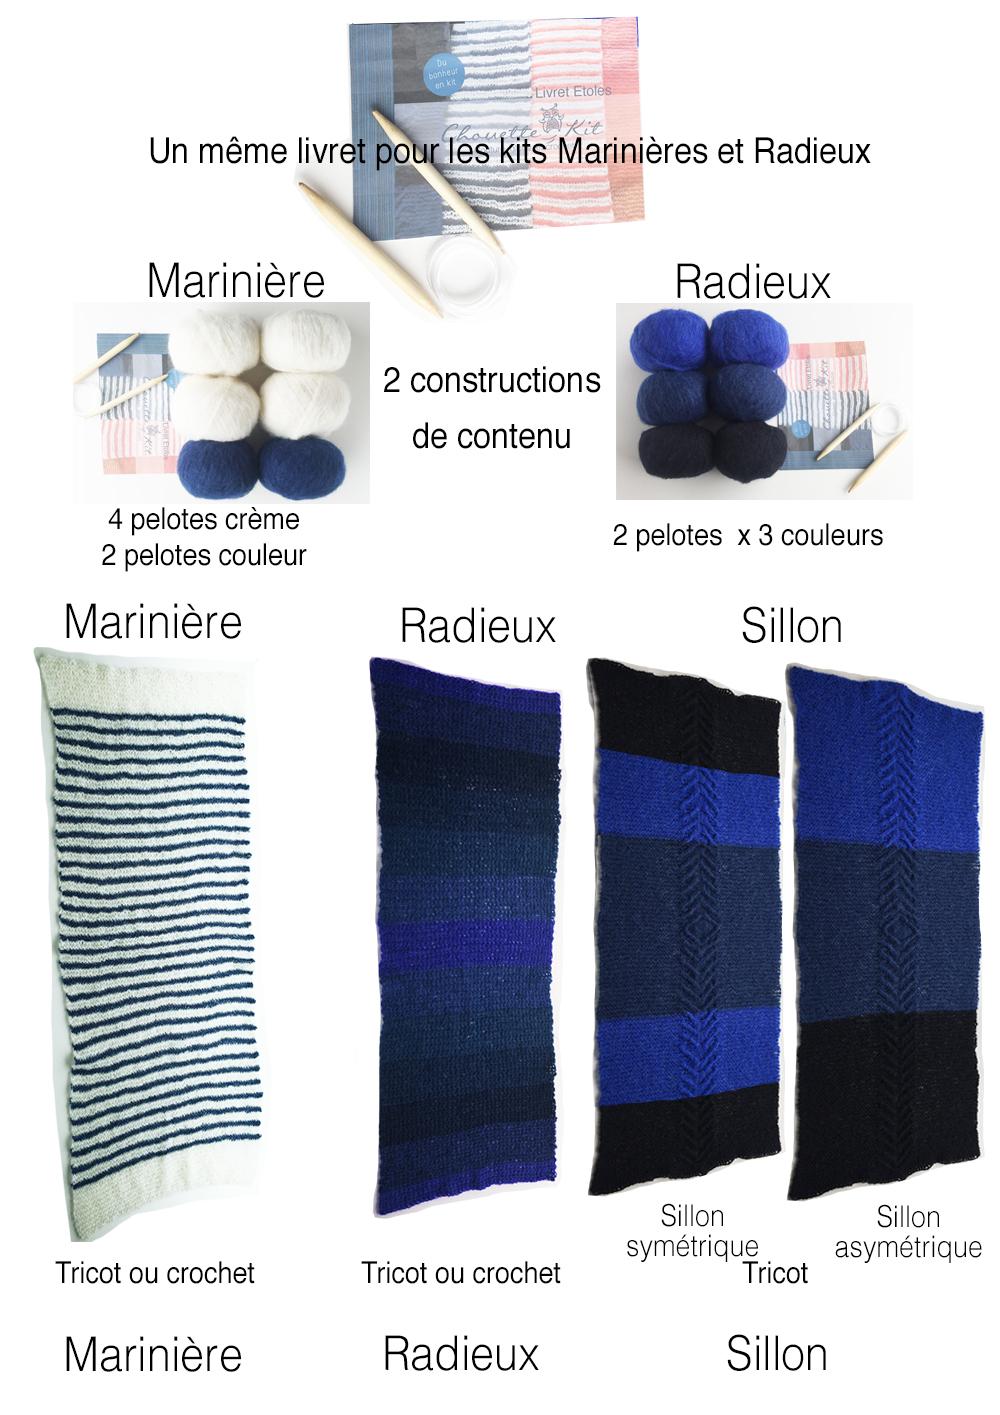 info radieux V2